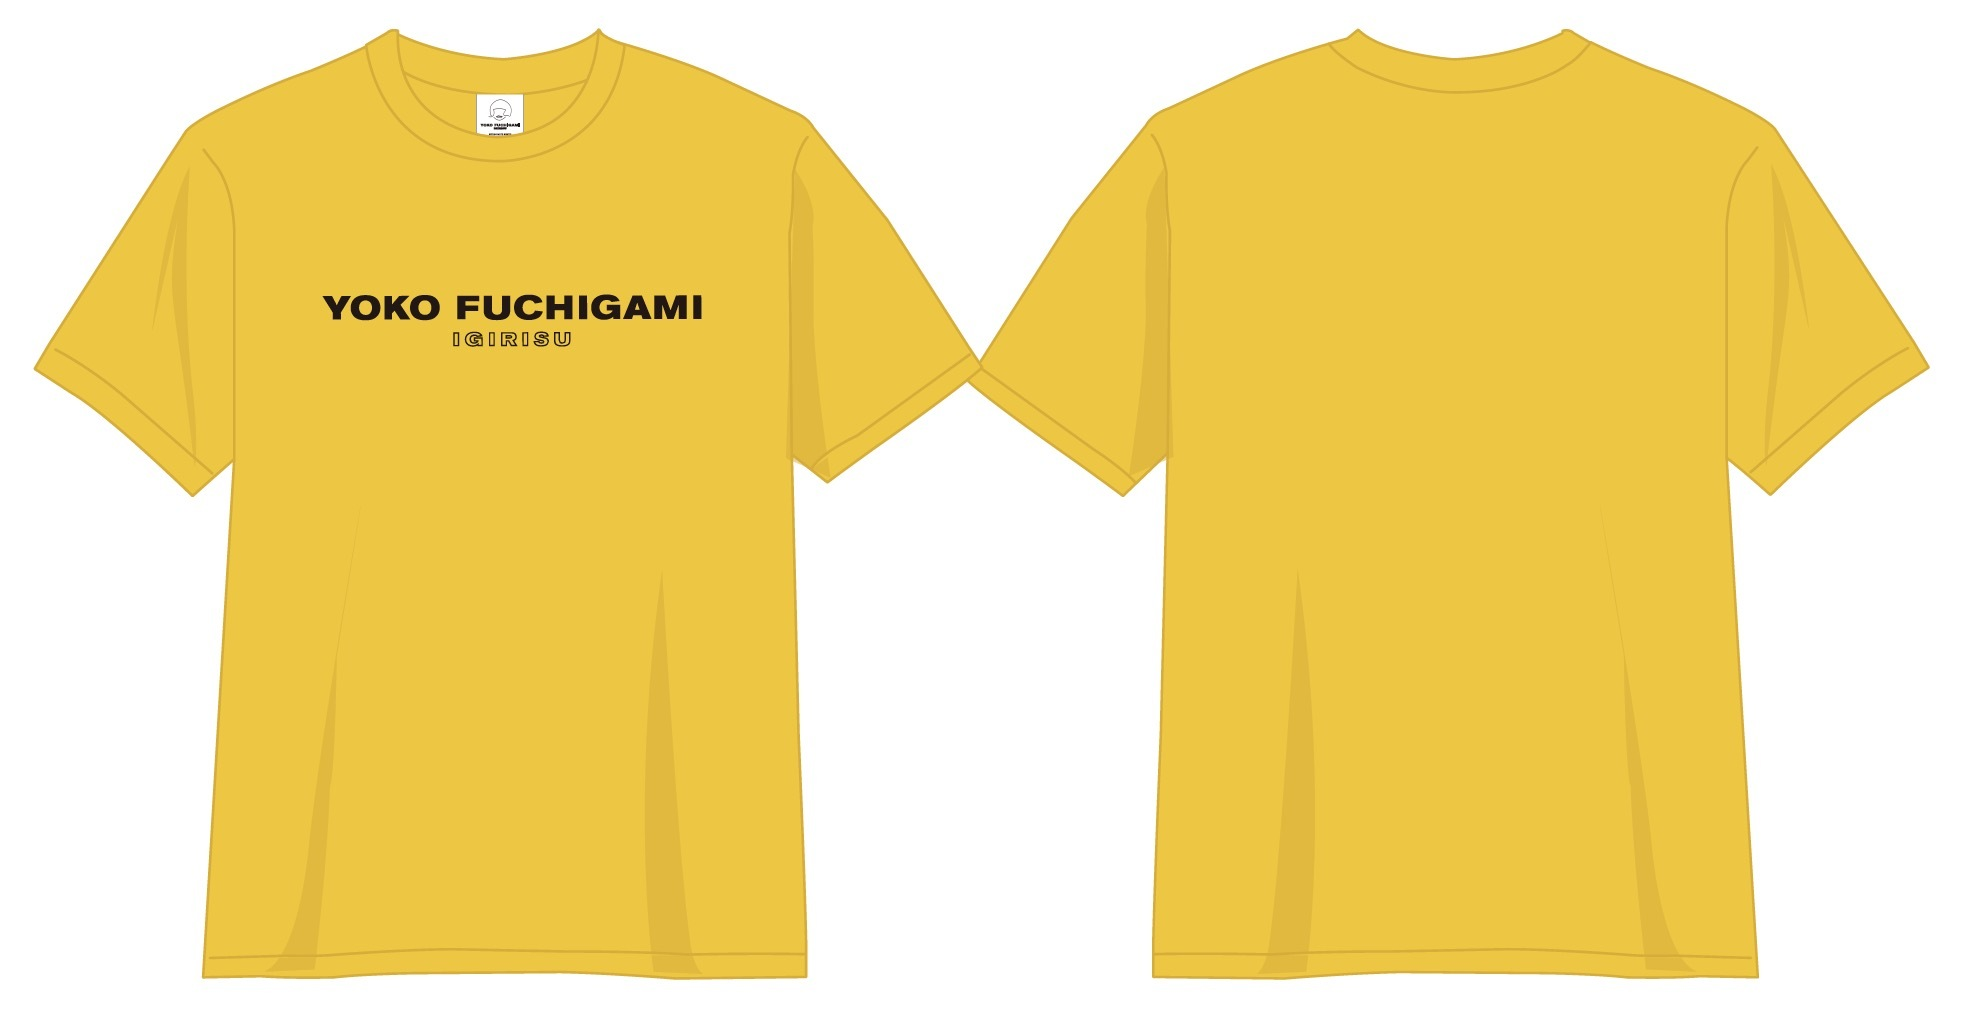 ★YOKO FUCHIGAMI STORE オリジナルTシャツ(M/L) 3,564円